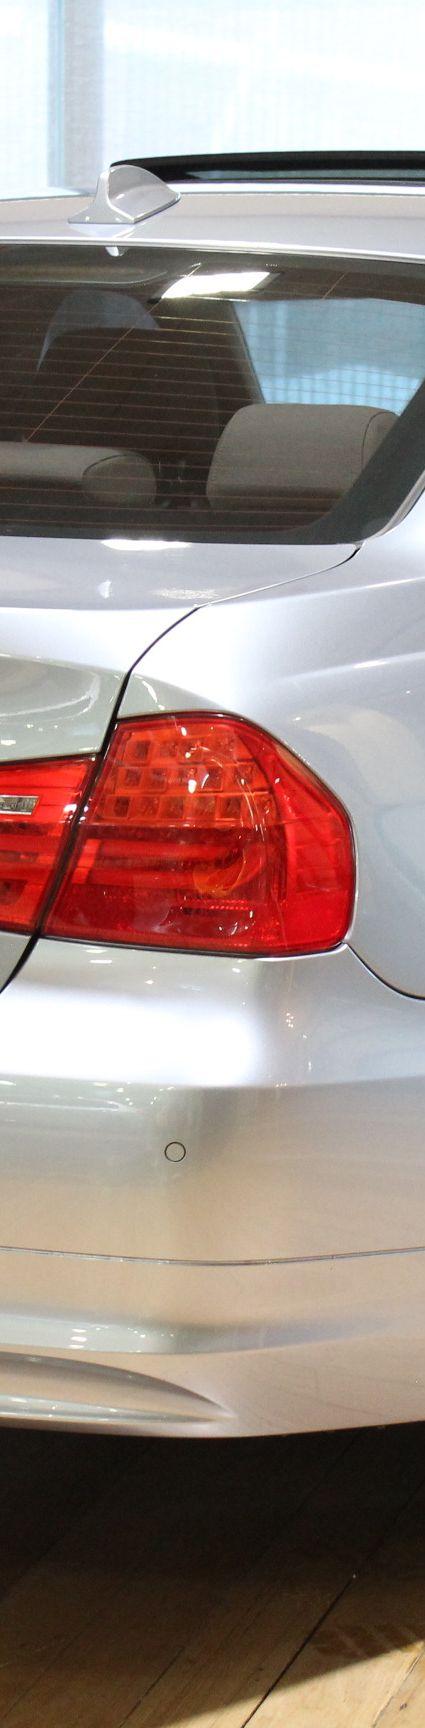 2010 BMW 320i E90 Lifestyle Sedan 4dr Steptronic 6sp 2.0i  - for sale in Australia